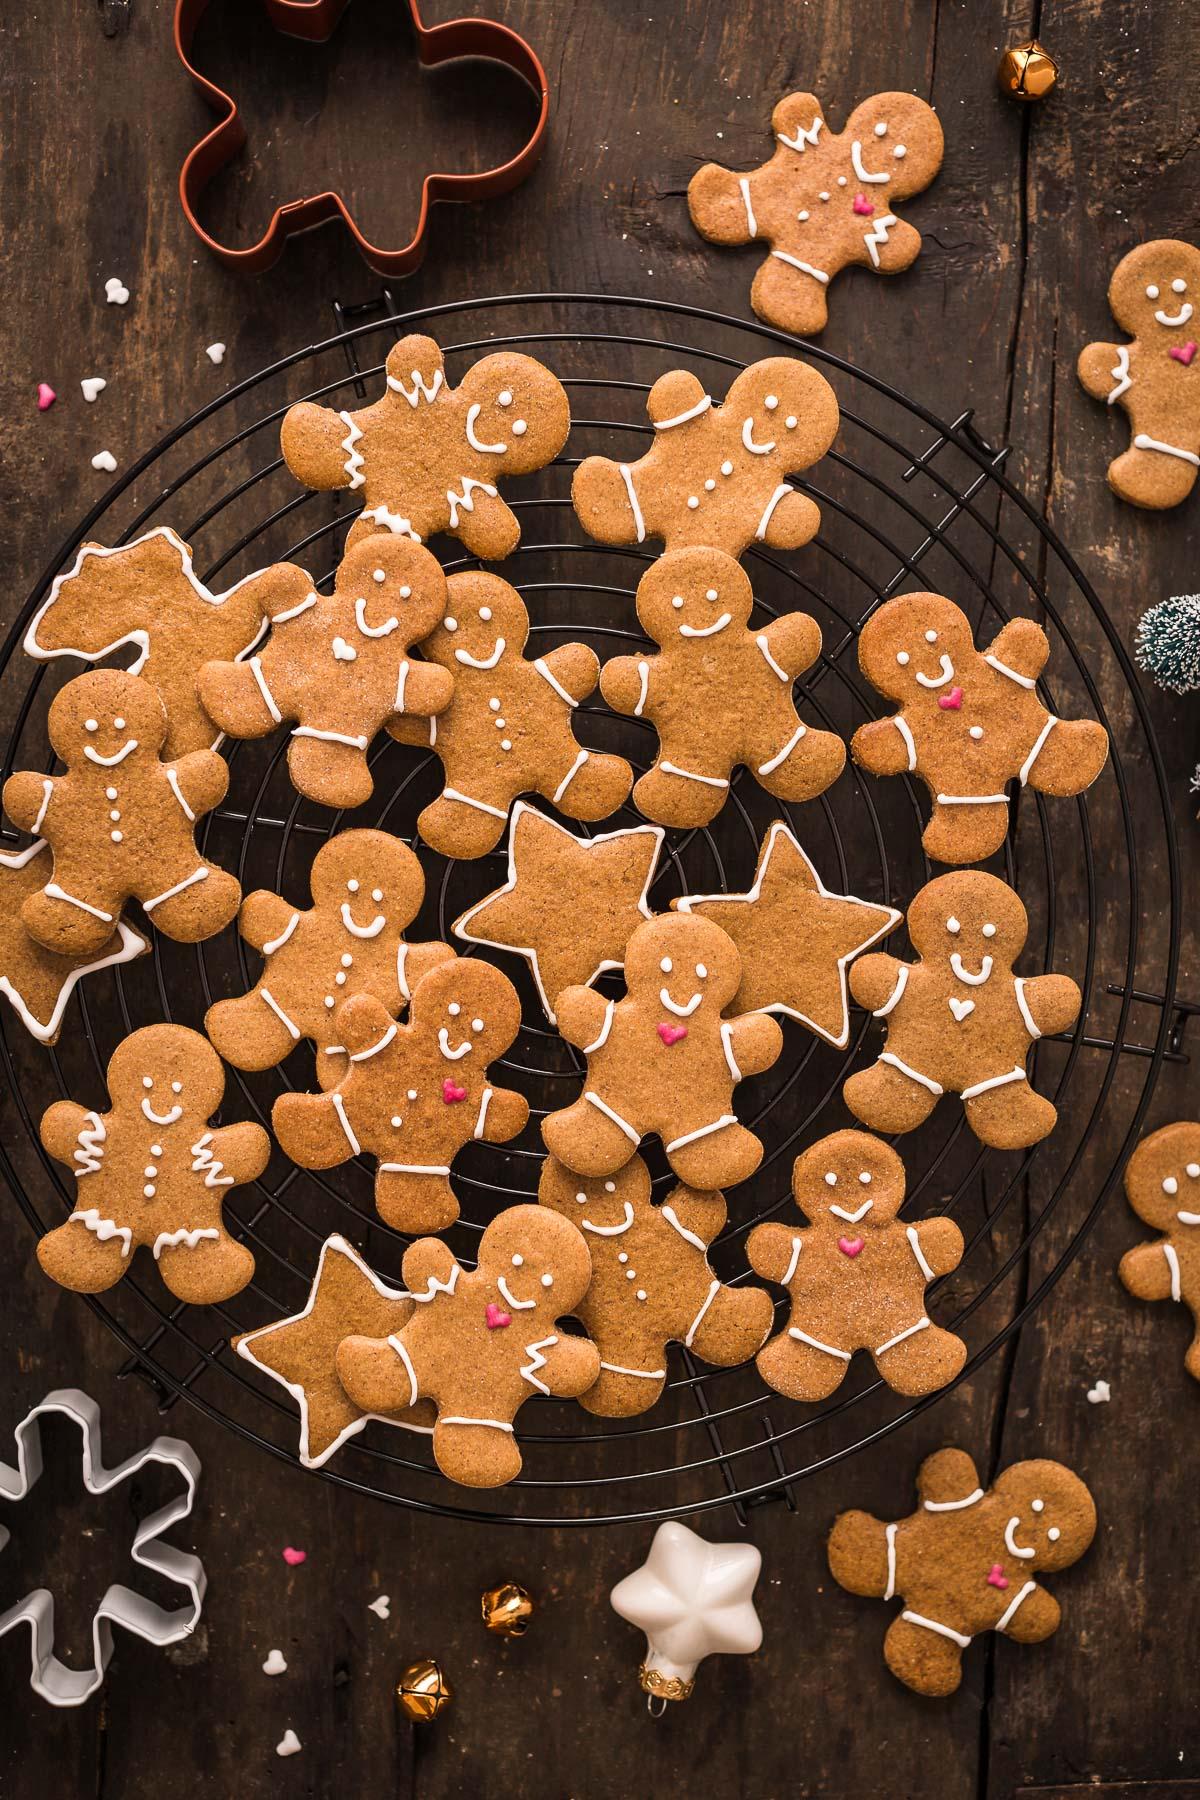 delicious vegan gingerbread man vegani - biscotti pan di zenzero vegani croccanti leggeri e friabili #vegan #gingerbread man cookies #biscotti natale